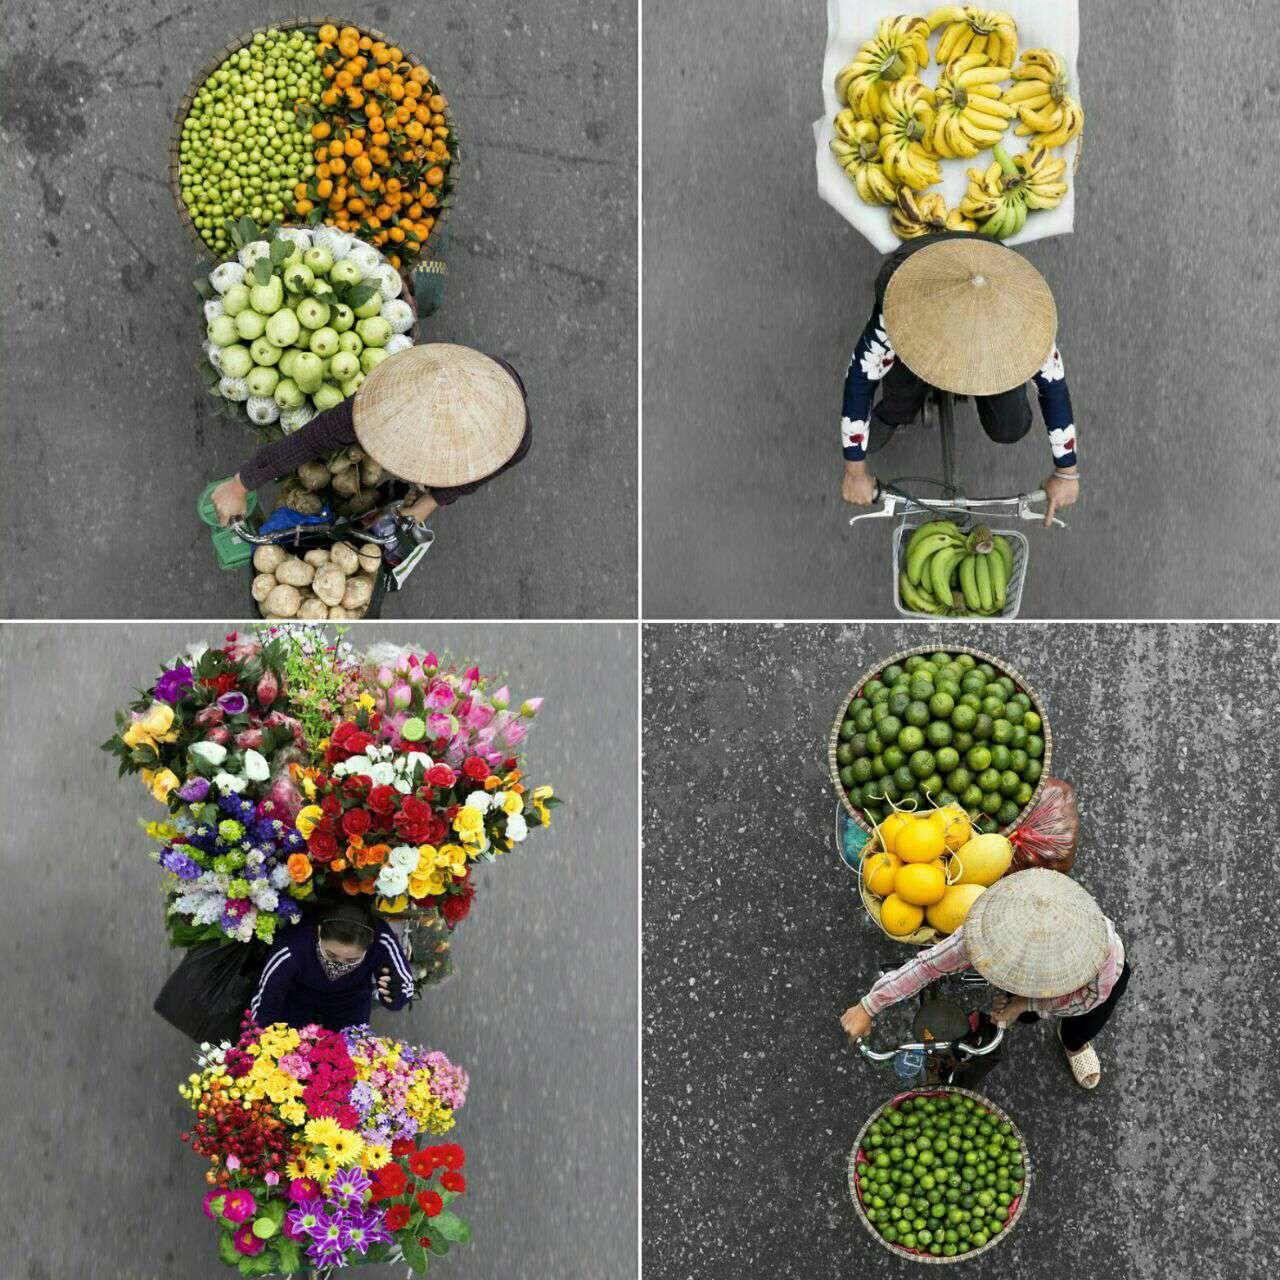 دستفروشان ویتنامی